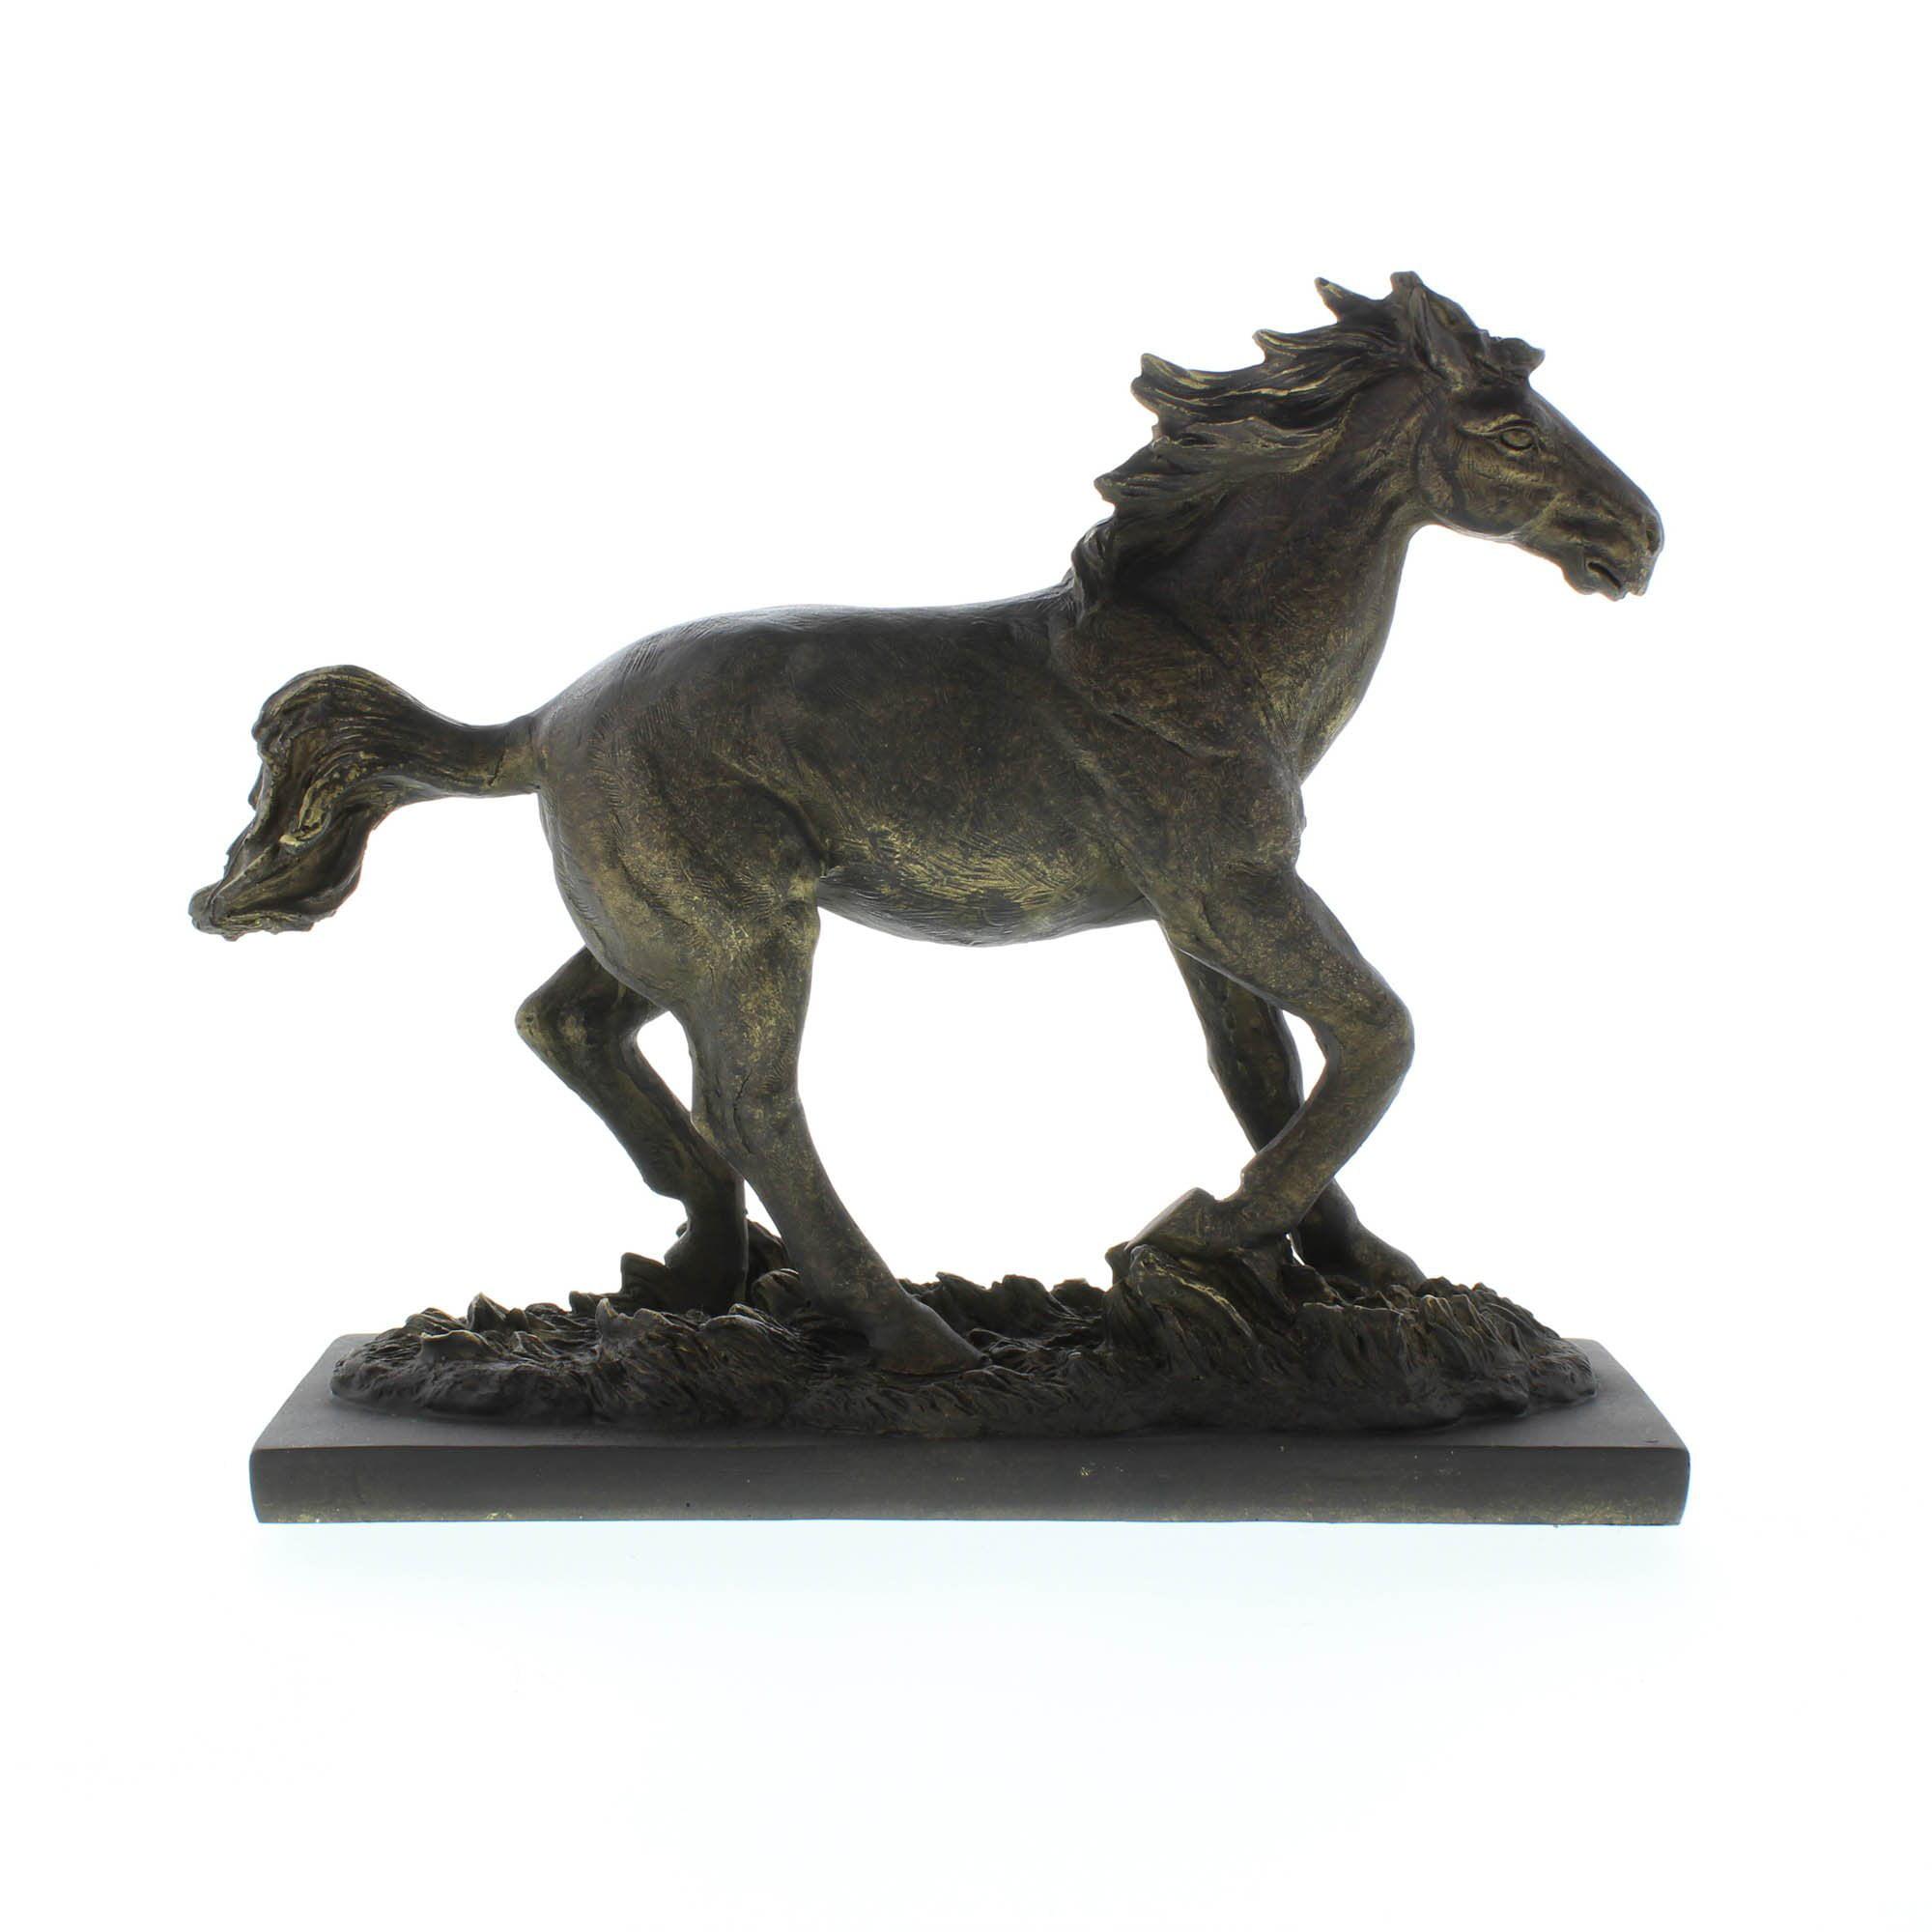 Horse Statue Stallion Black Race Horse Sculpture Decor Desk Art Walmart Com Walmart Com